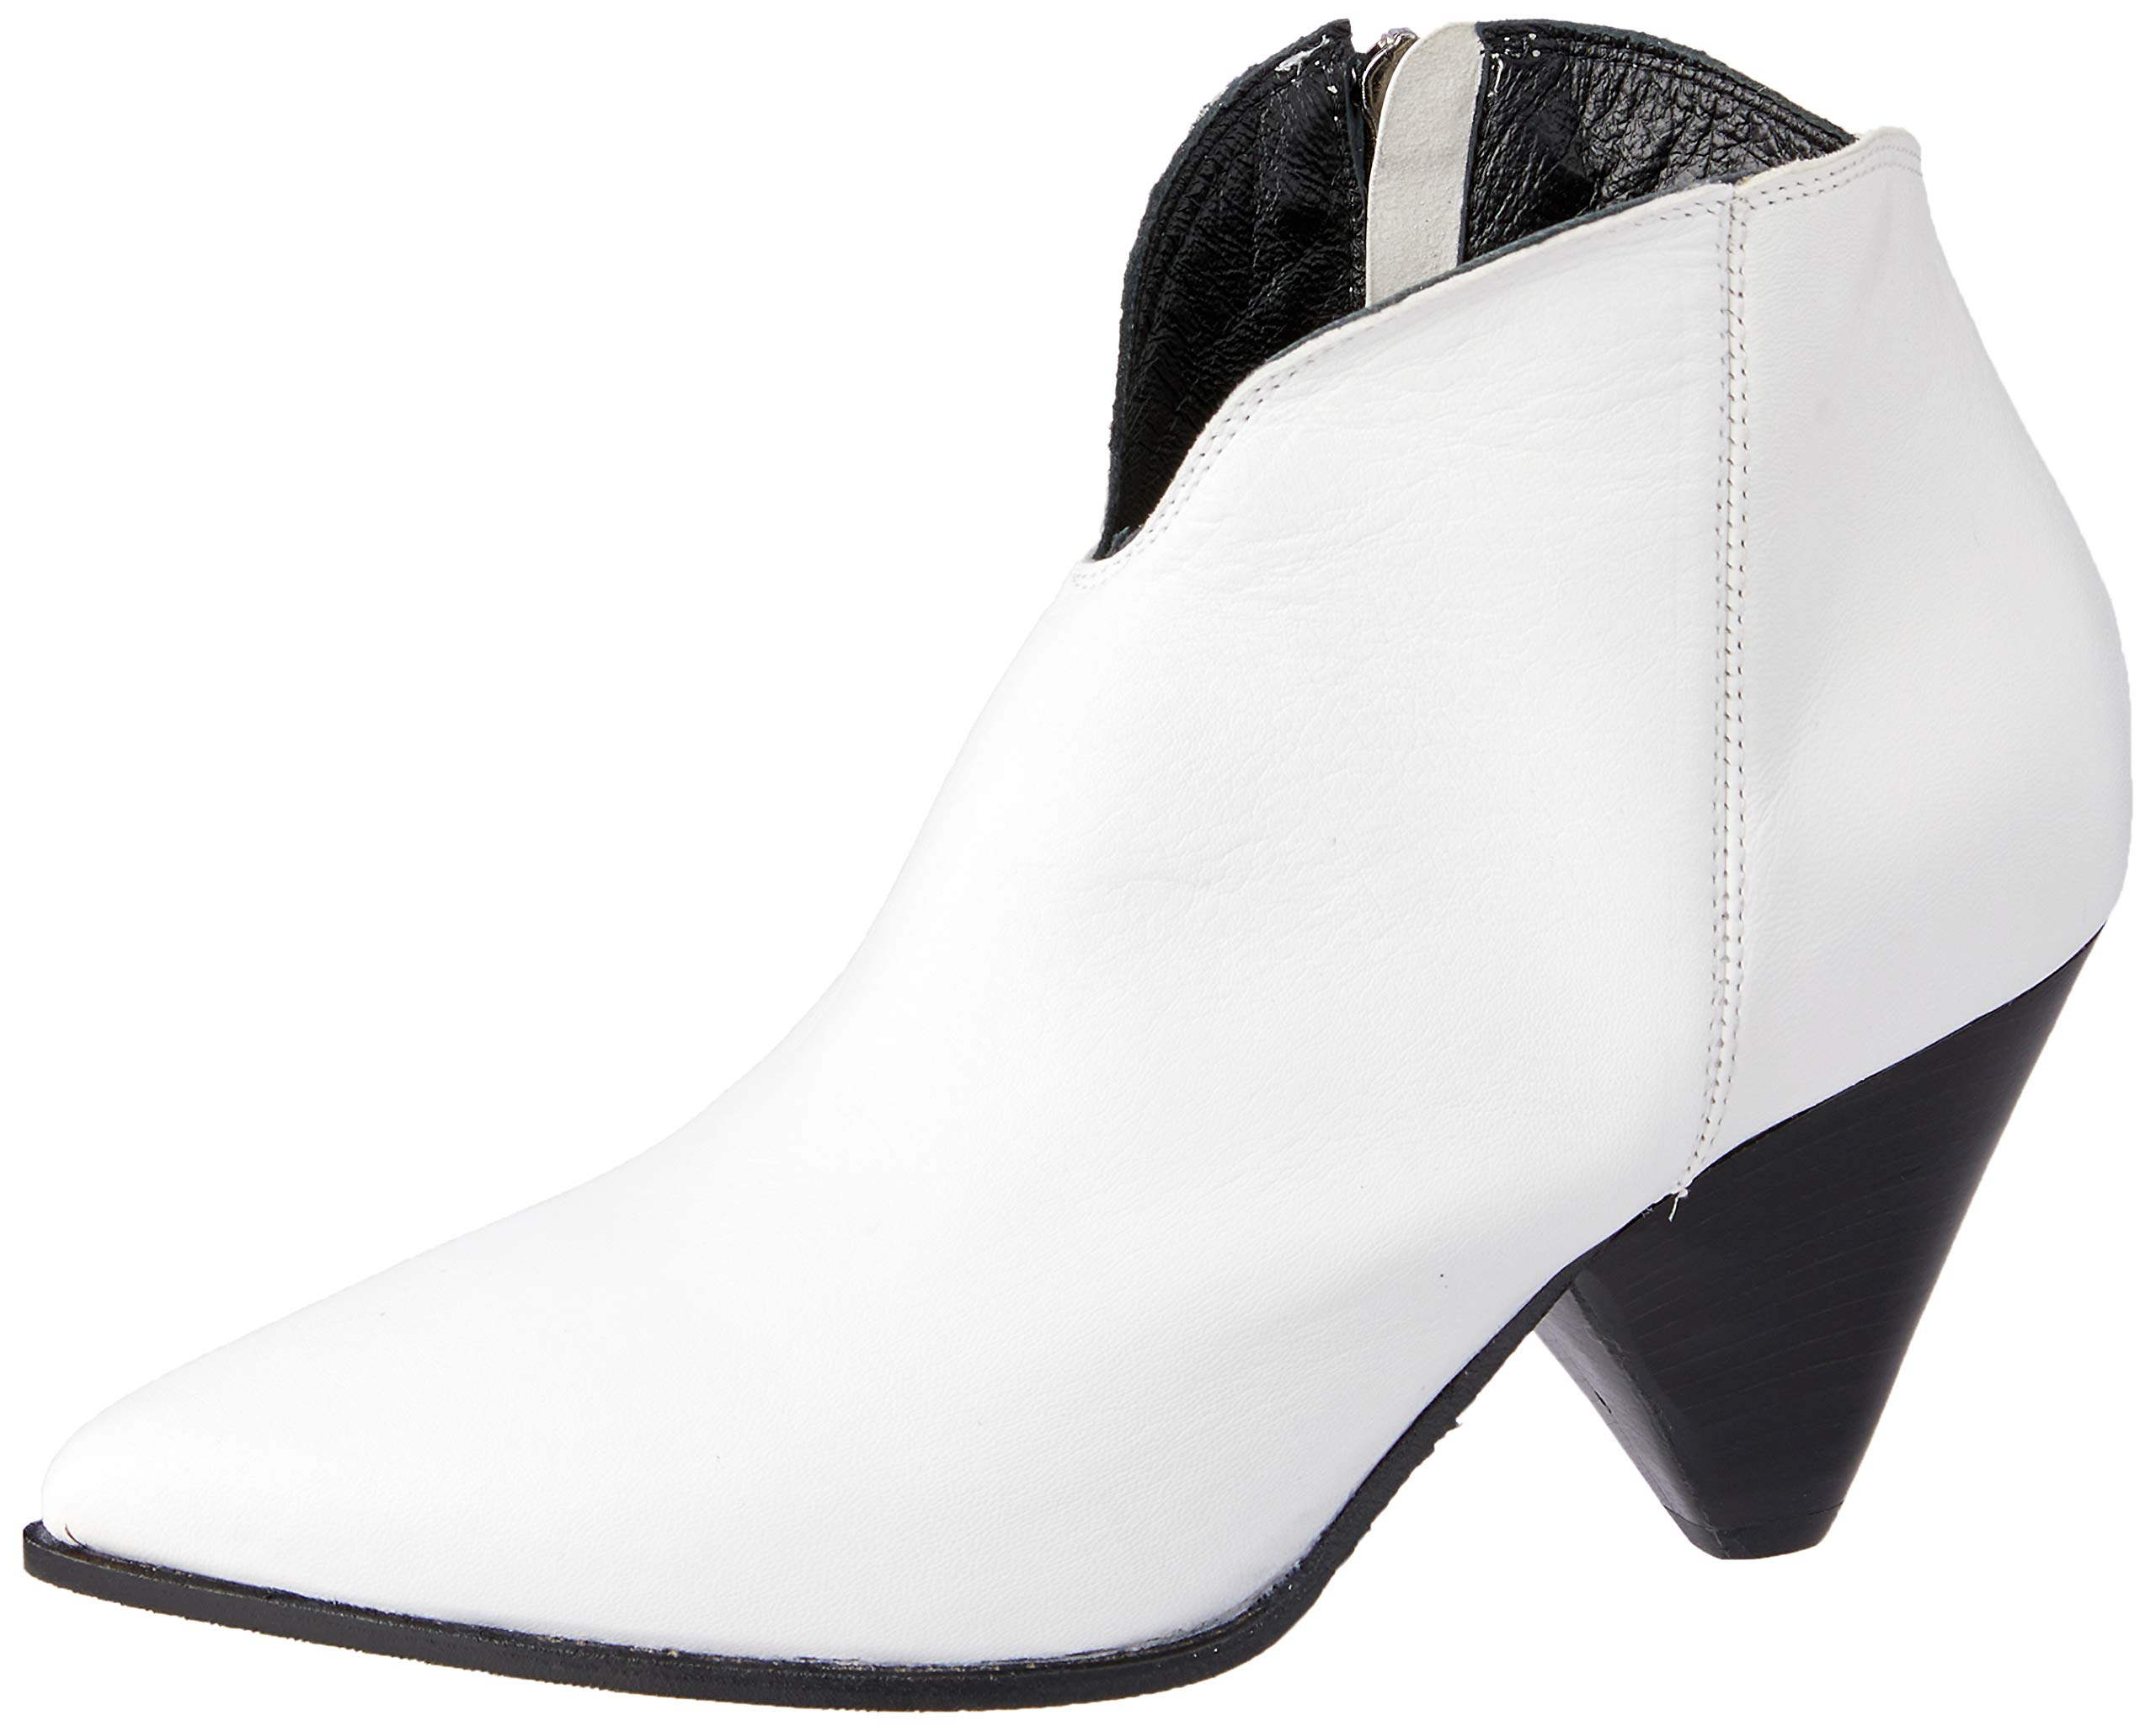 Cambridge shoe